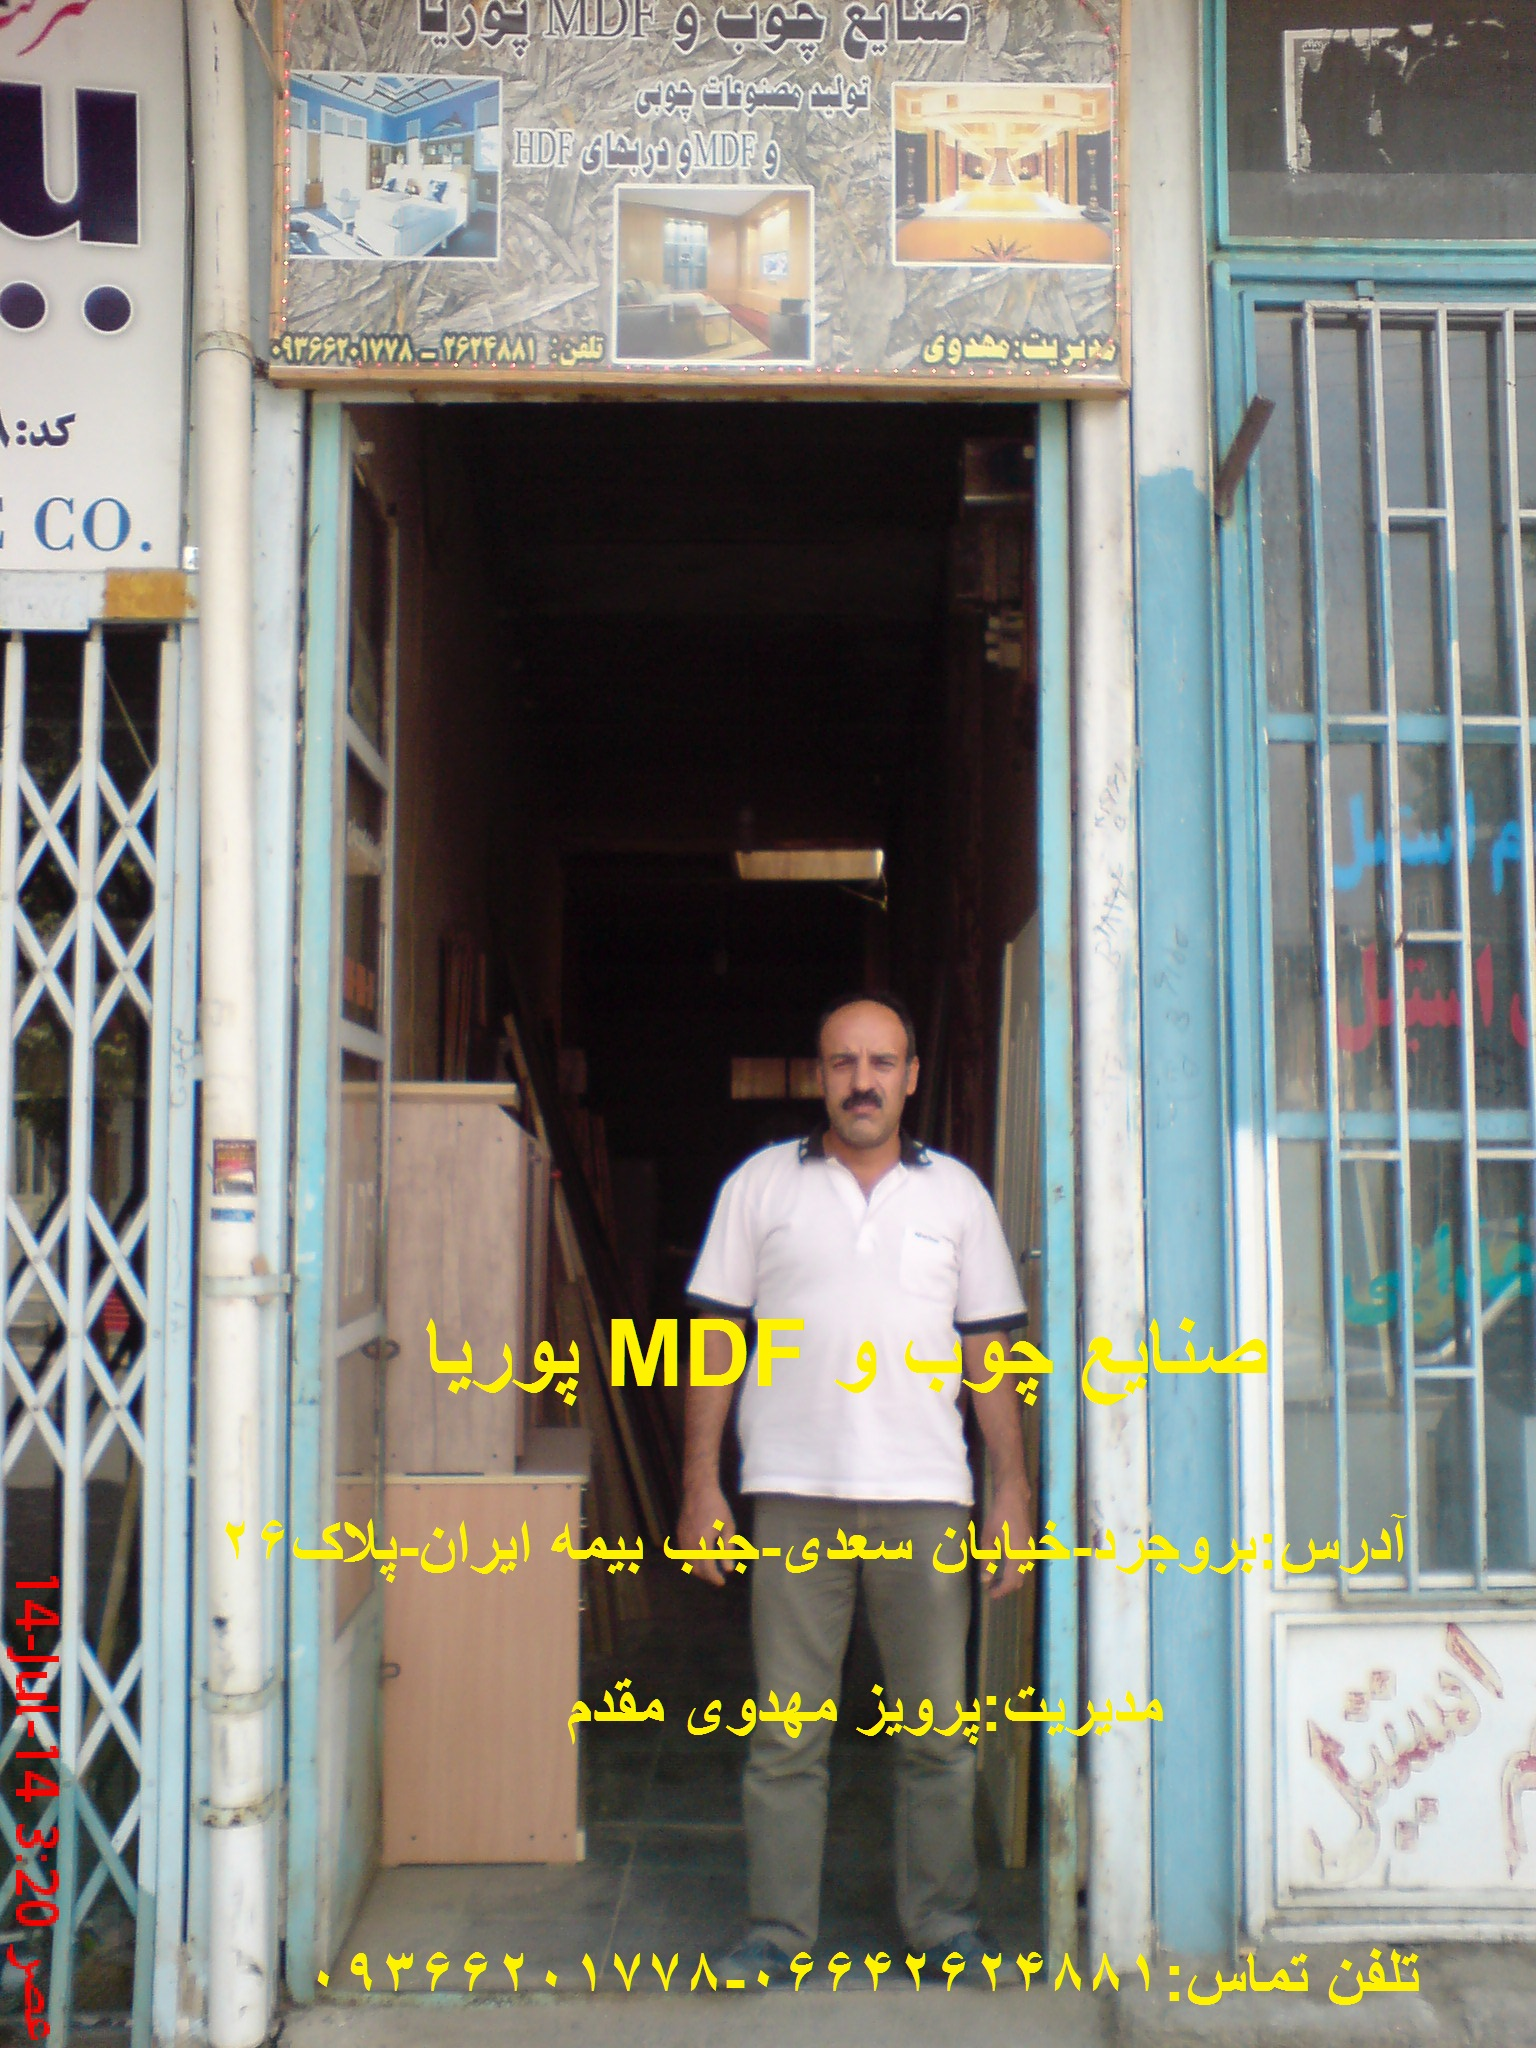 صنایع چوب پوریا-بروجرد خیابان سعدی-مدیریت مهدوی